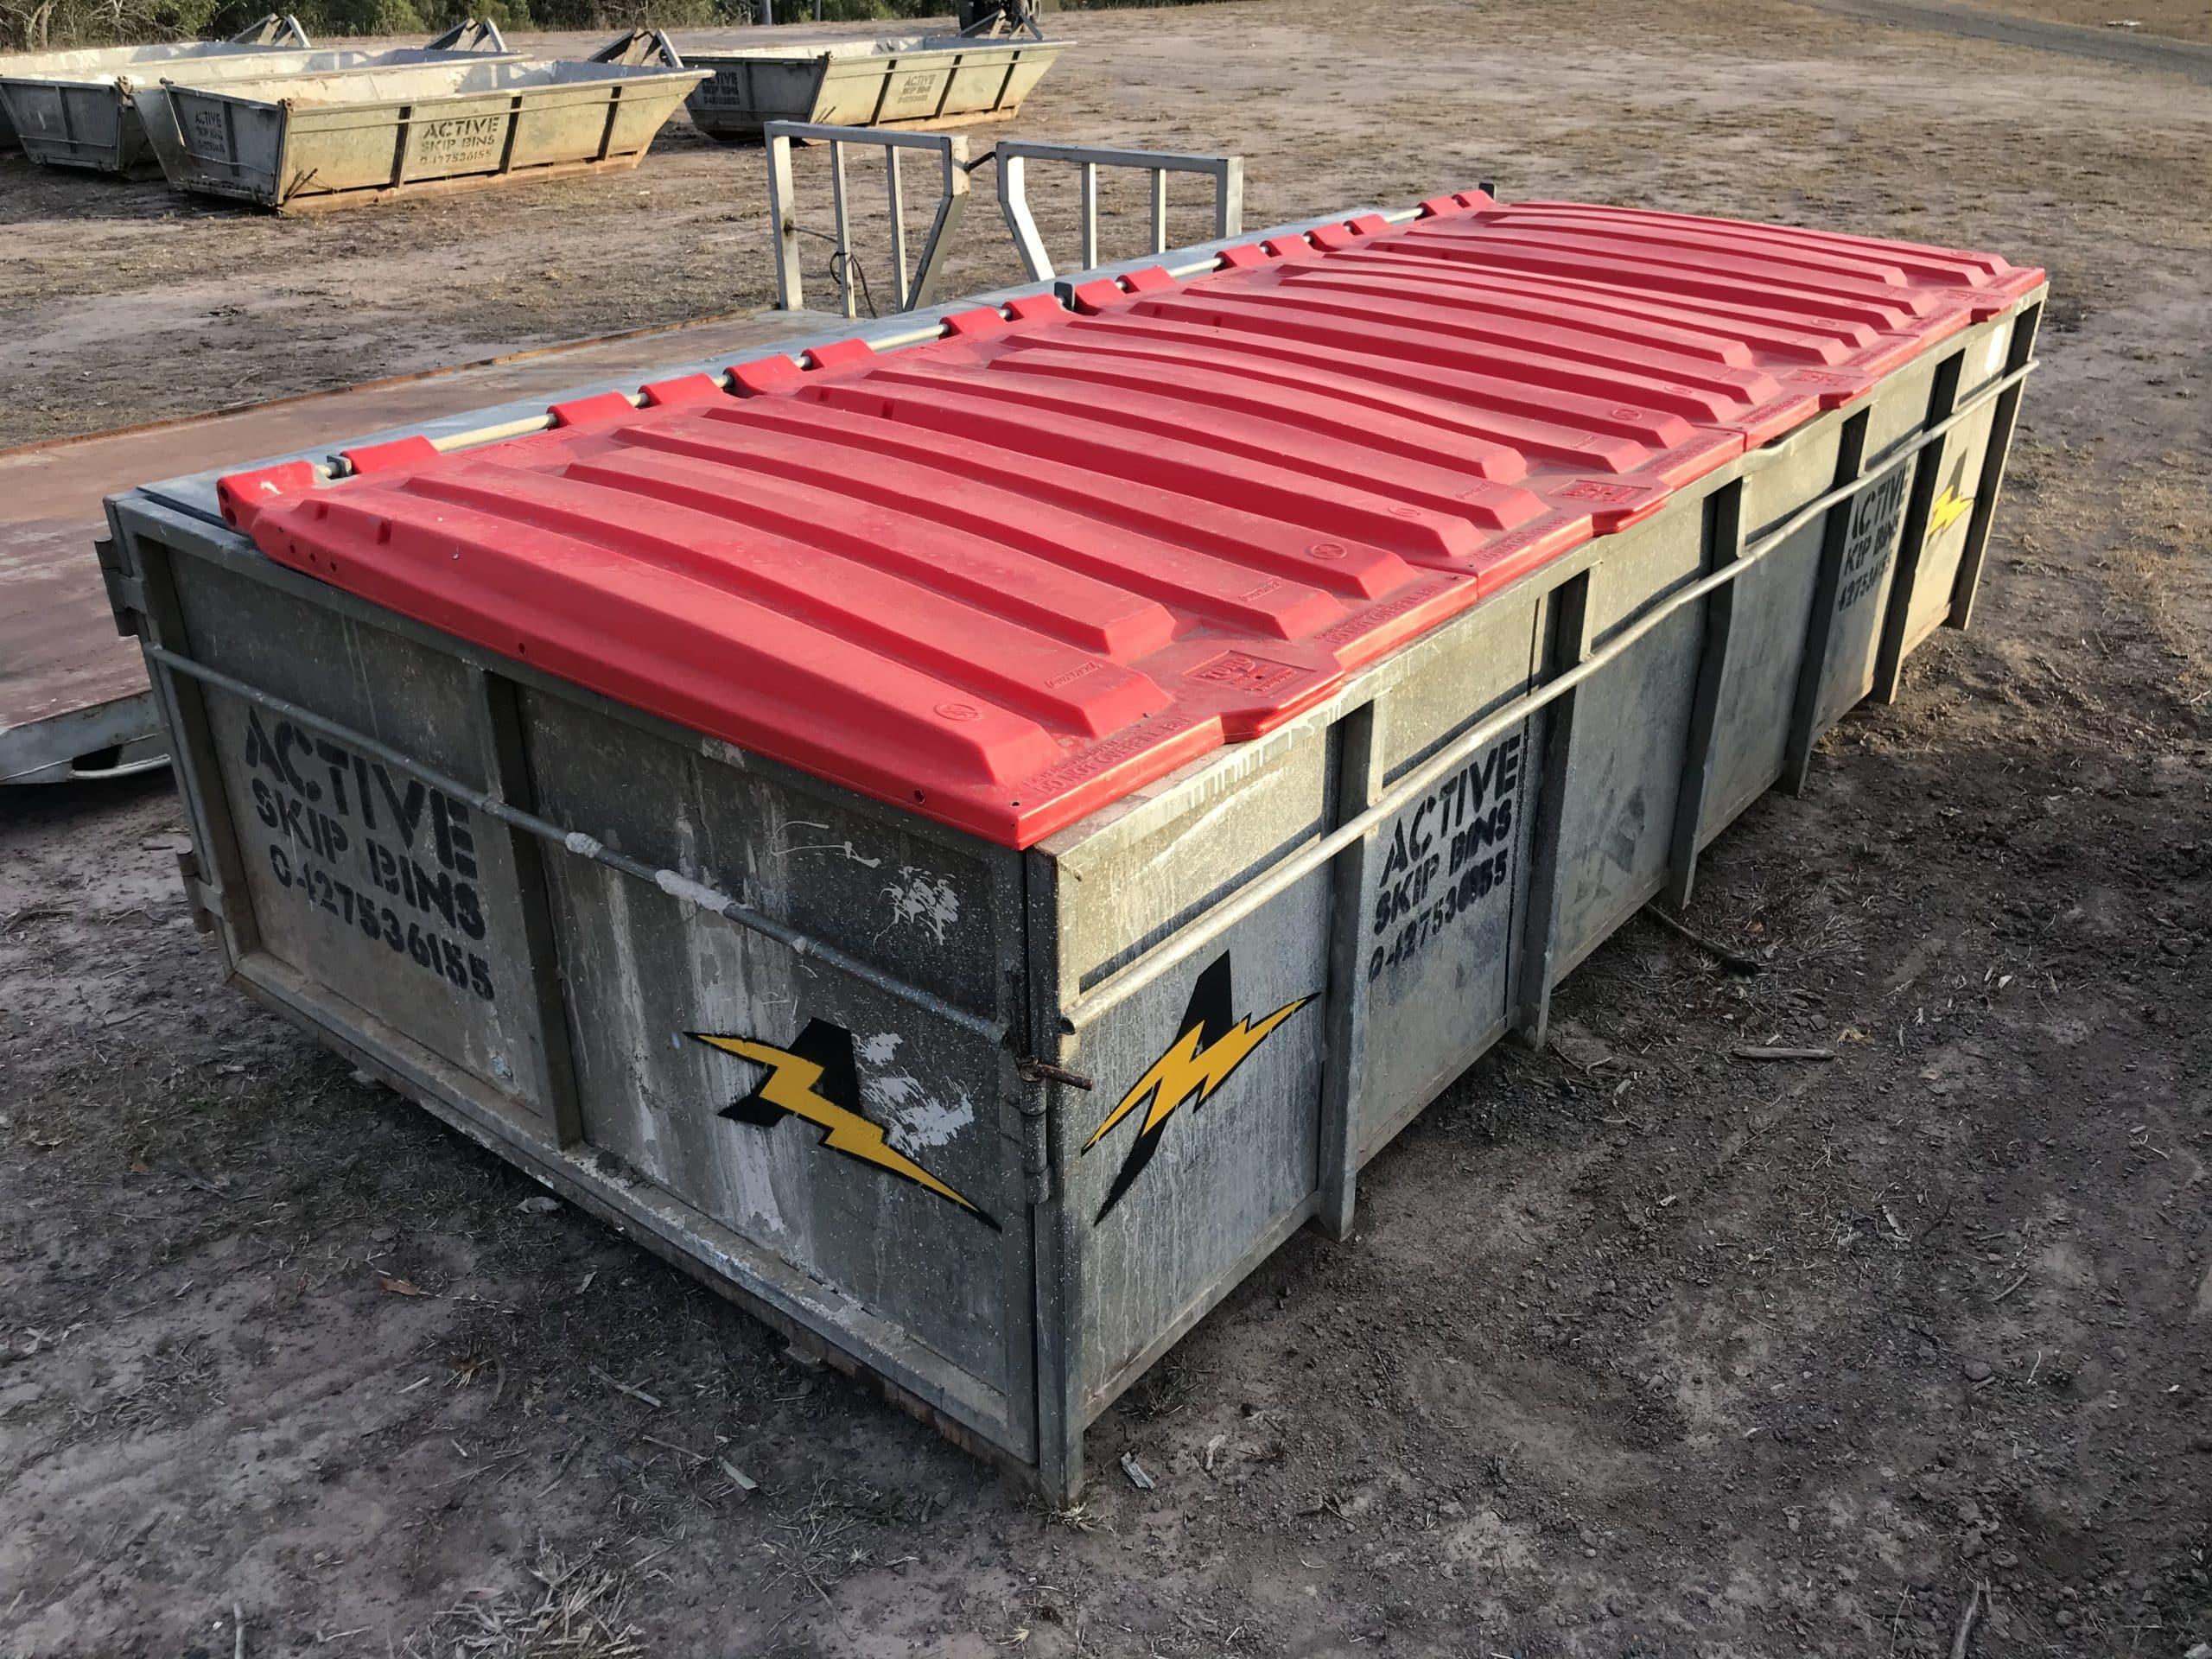 6m³ bin with plastic lids — Rubbish Remova in Bundaberg, QLD